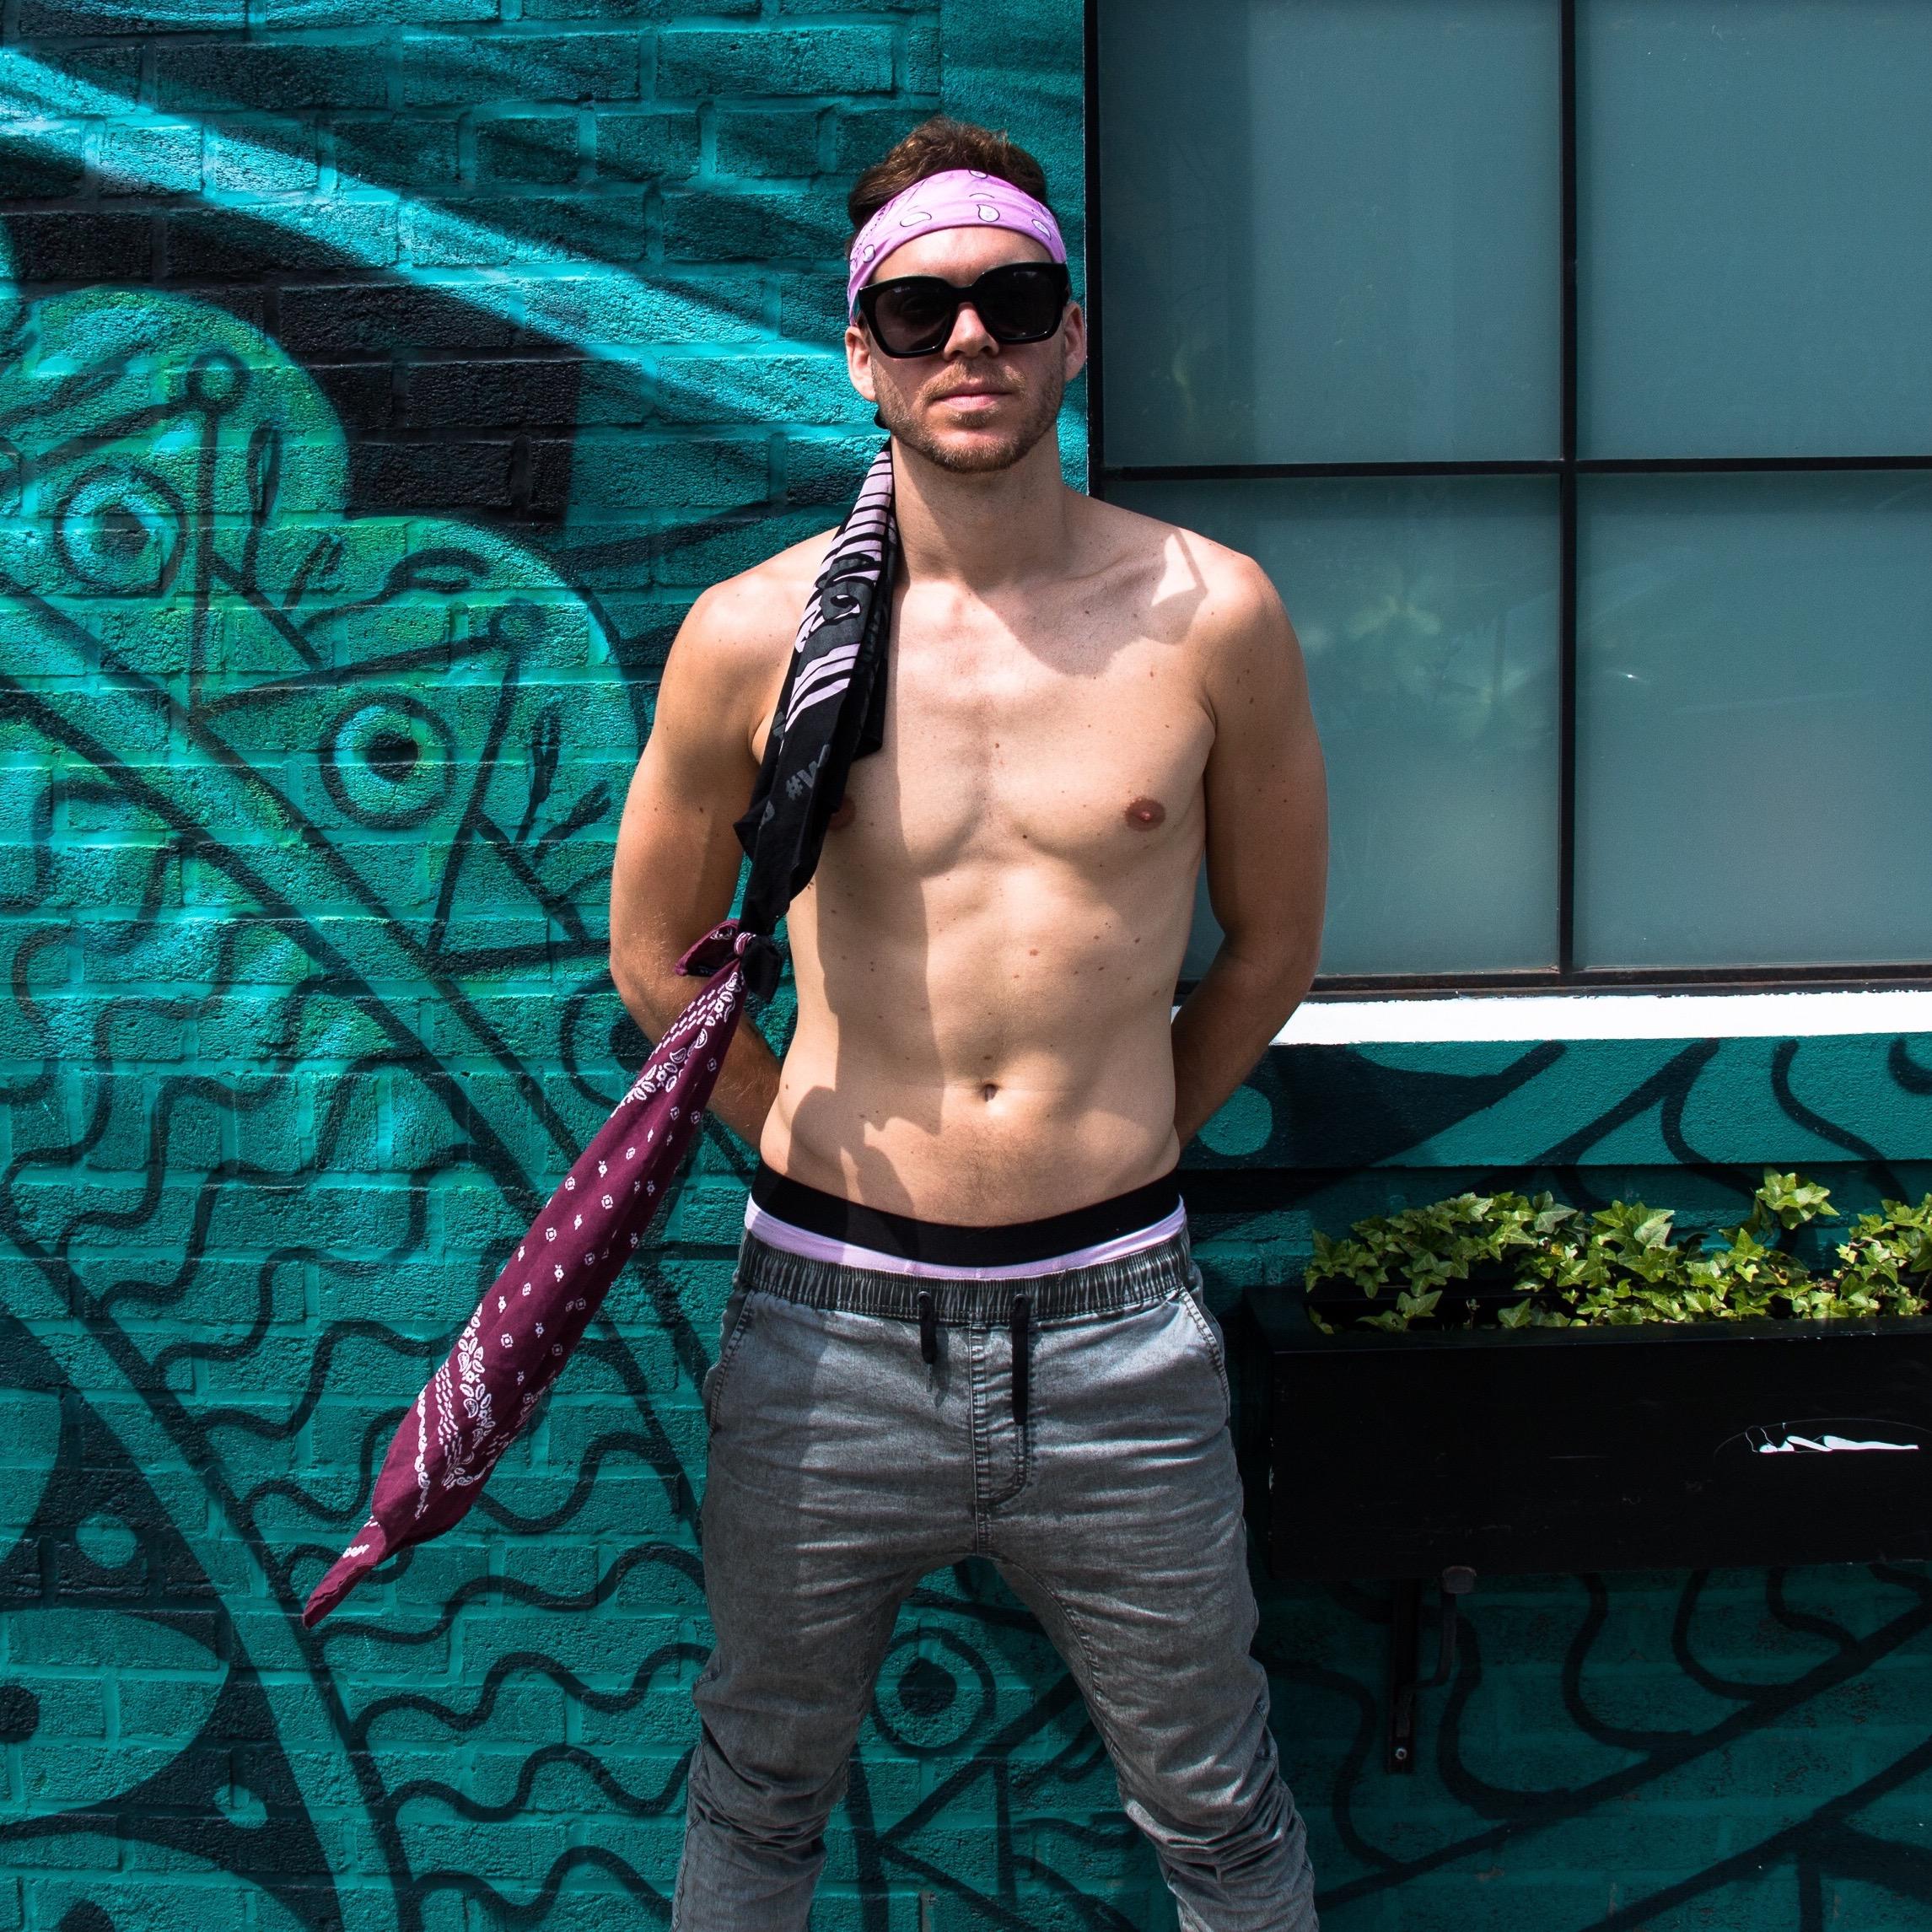 Style - Pants: ZanerobeUnderwear: MeUndiesSunglasses: PerverseBandana Ponytail: The502Kid CreationPhoto: Tarik Carroll